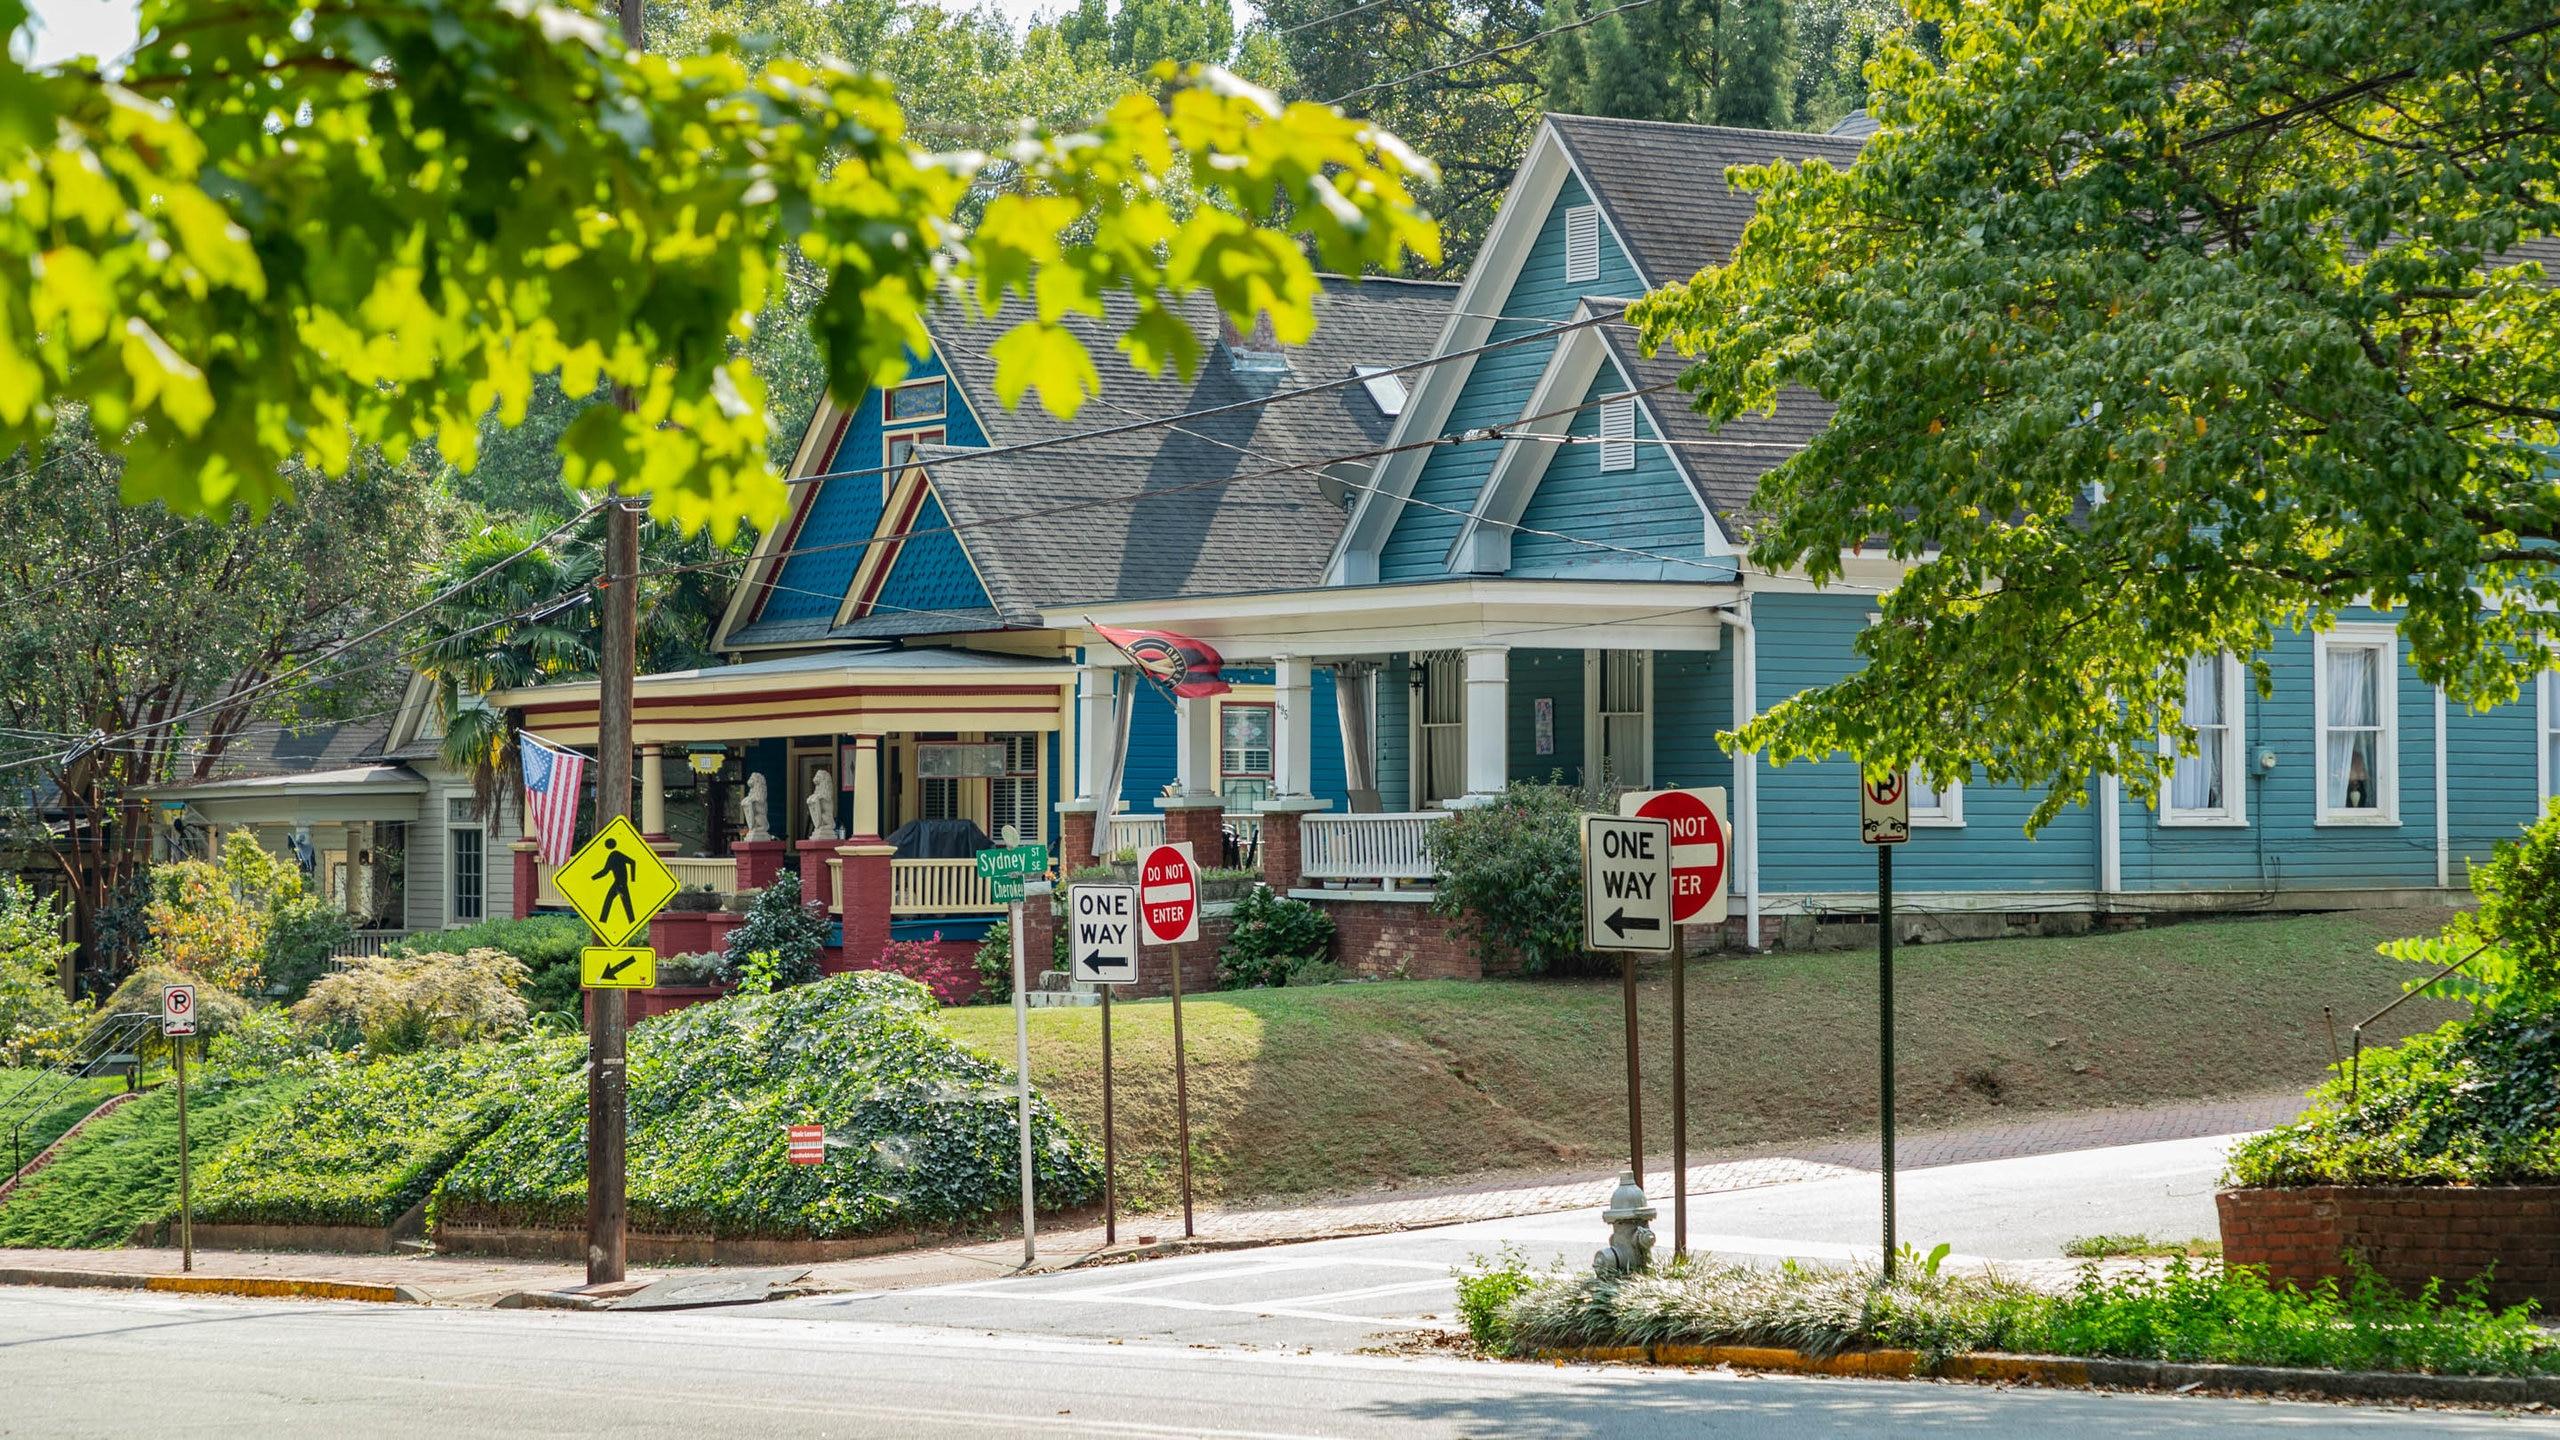 Grant Park, Atlanta, Georgia, United States of America